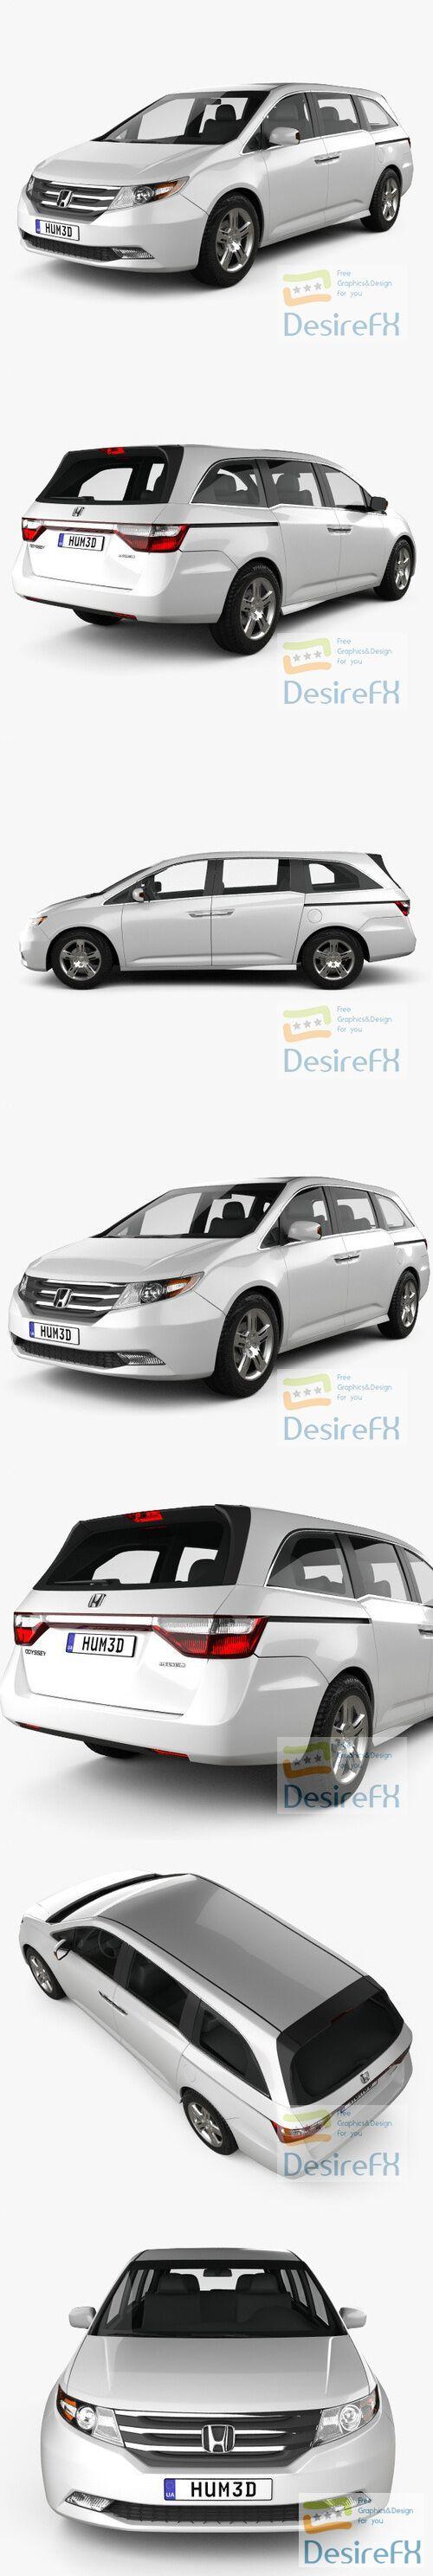 Honda Odyssey 2011 H3D Model